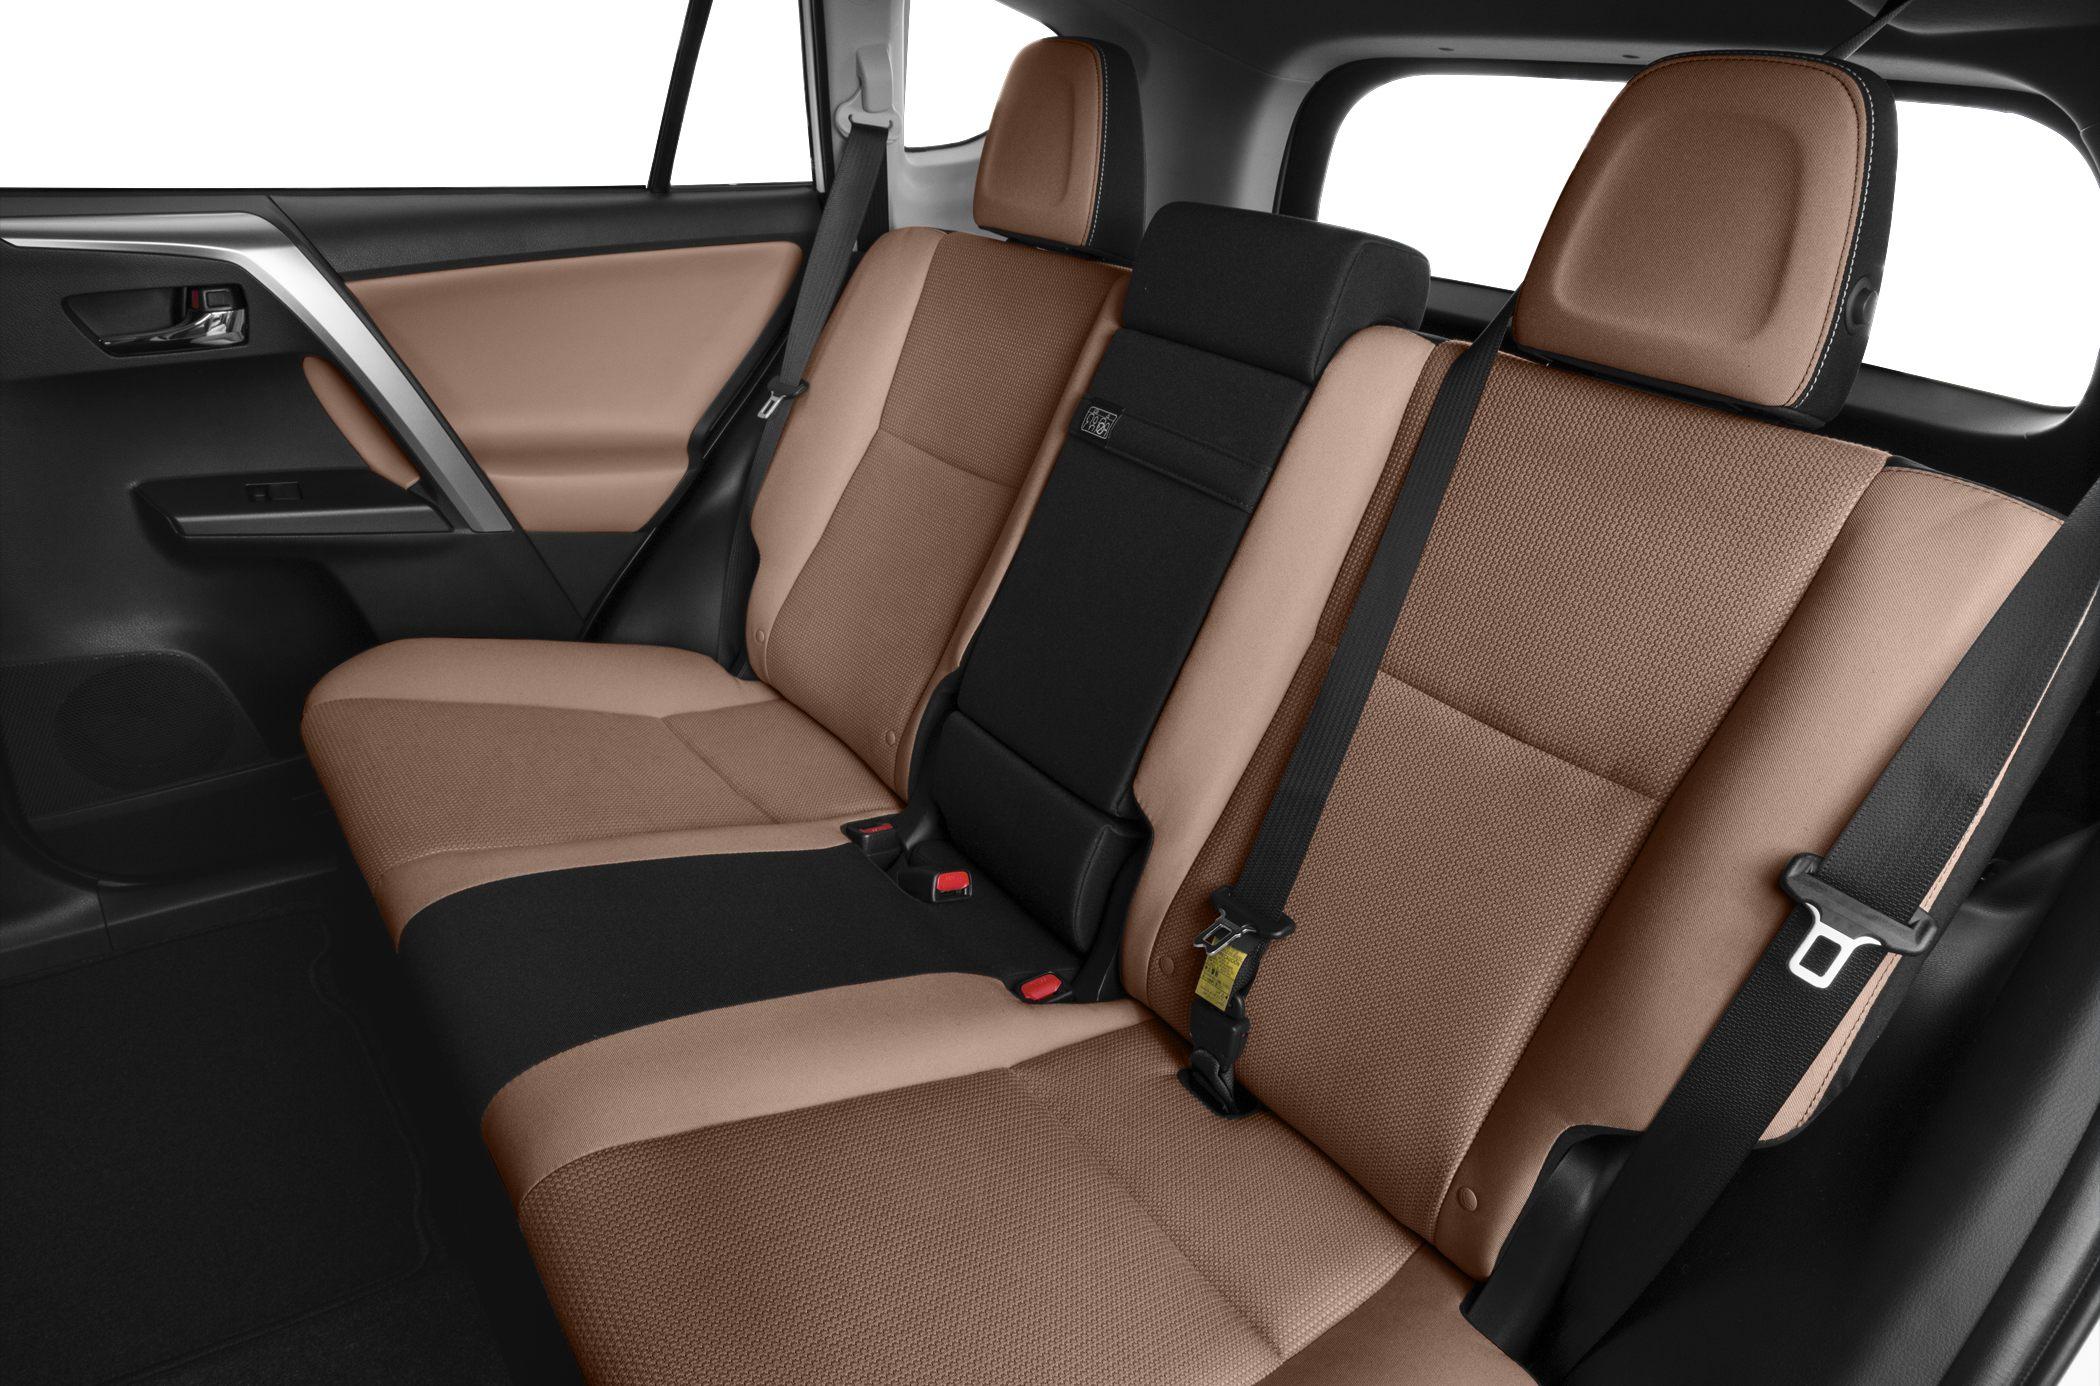 2017 toyota rav4 hybrid deals prices incentives leases overview carsdirect. Black Bedroom Furniture Sets. Home Design Ideas